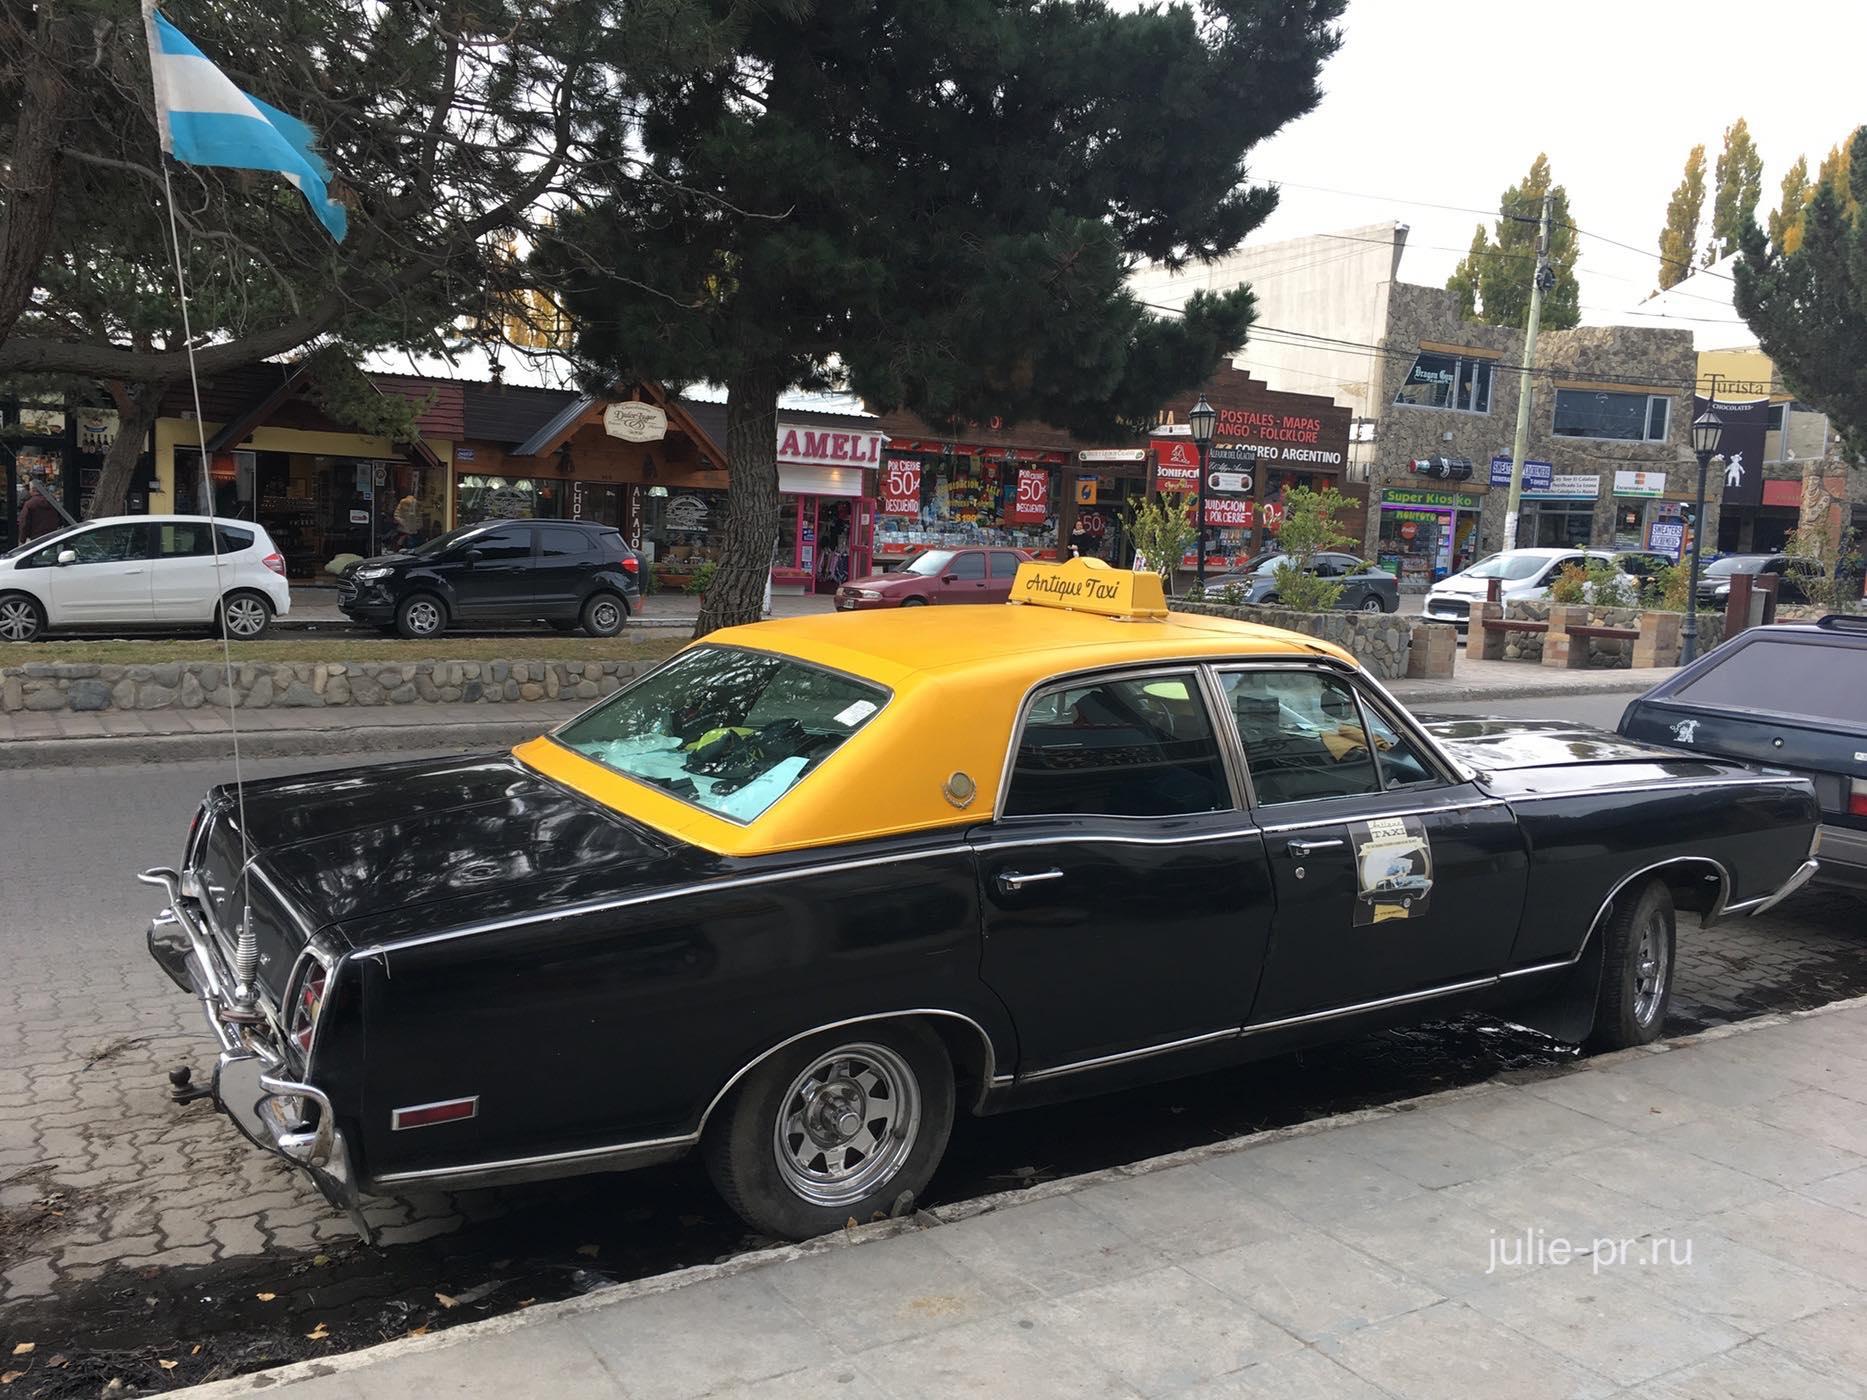 Аргентина, Патагония, Эль-Калафате, винтажное такси